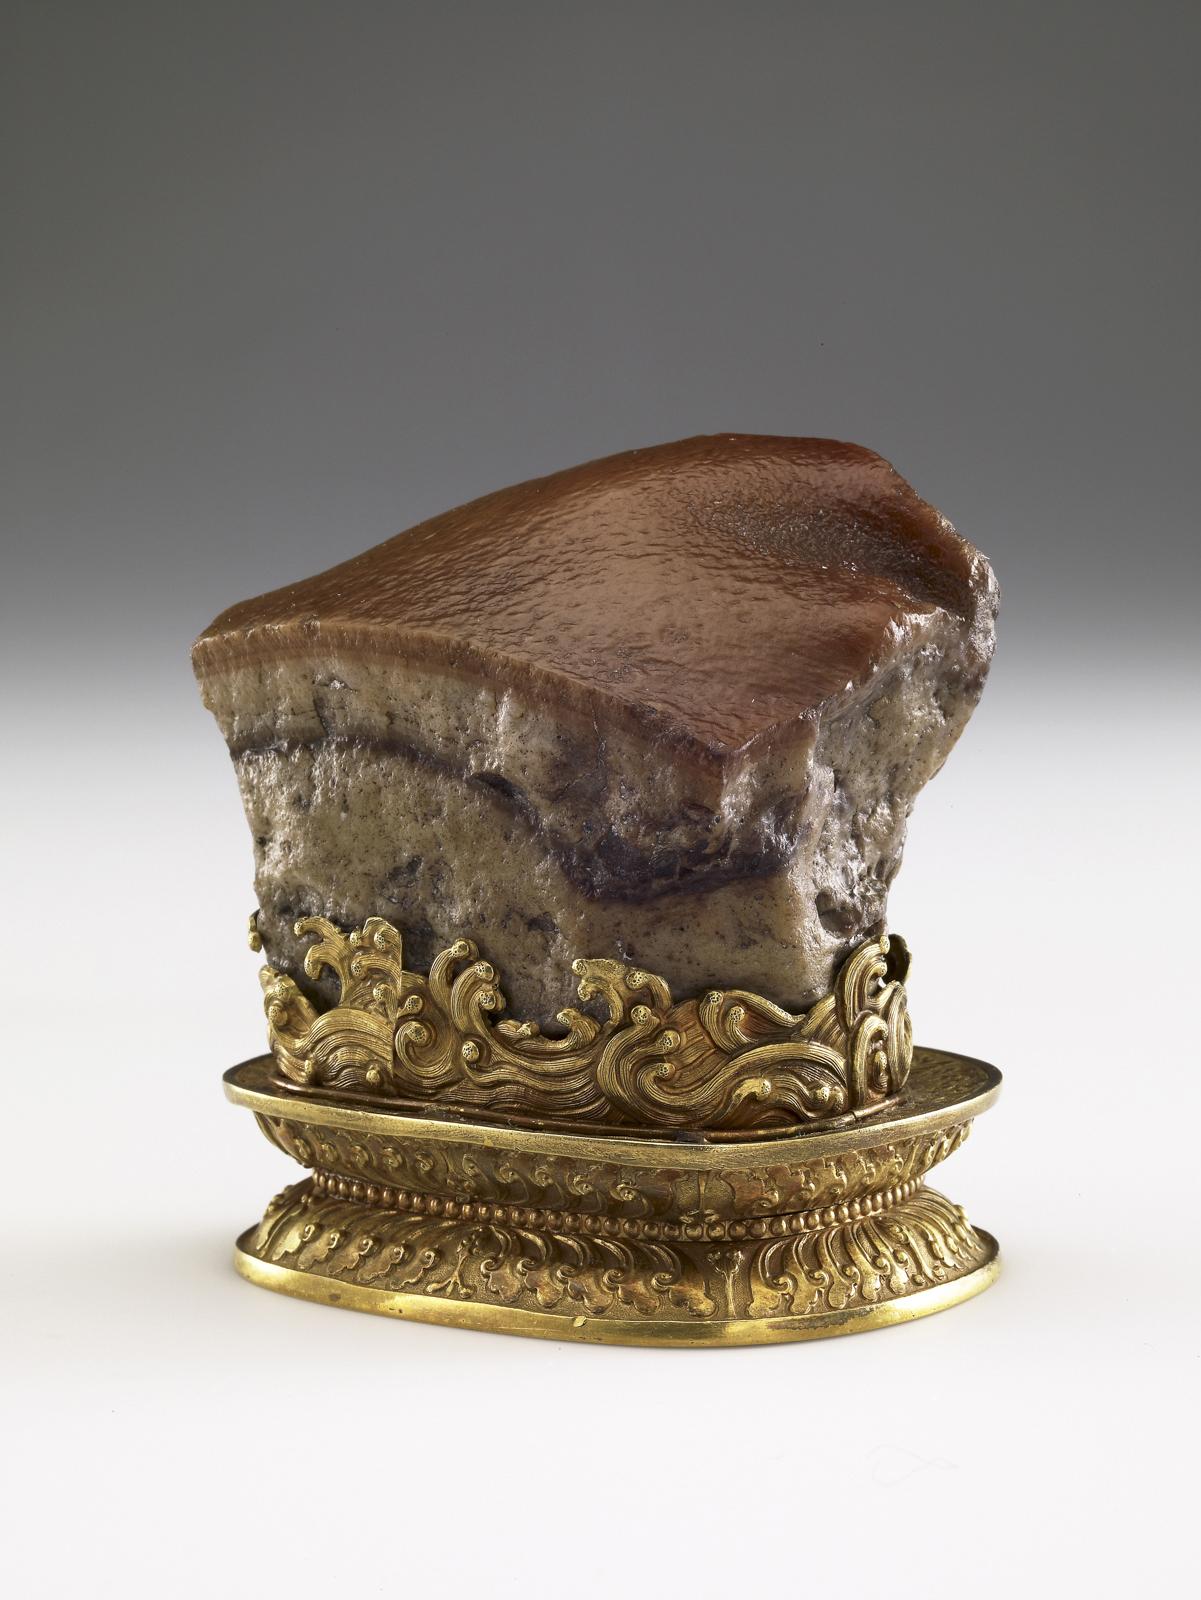 Meat-shaped stone, China, Qing dynasty (1644–1911). Stone: jasper; stand: gold. National Palace Museum, Taipei, Guza 000178 Lü-413. Photograph ©National Palace Museum, Taipei.